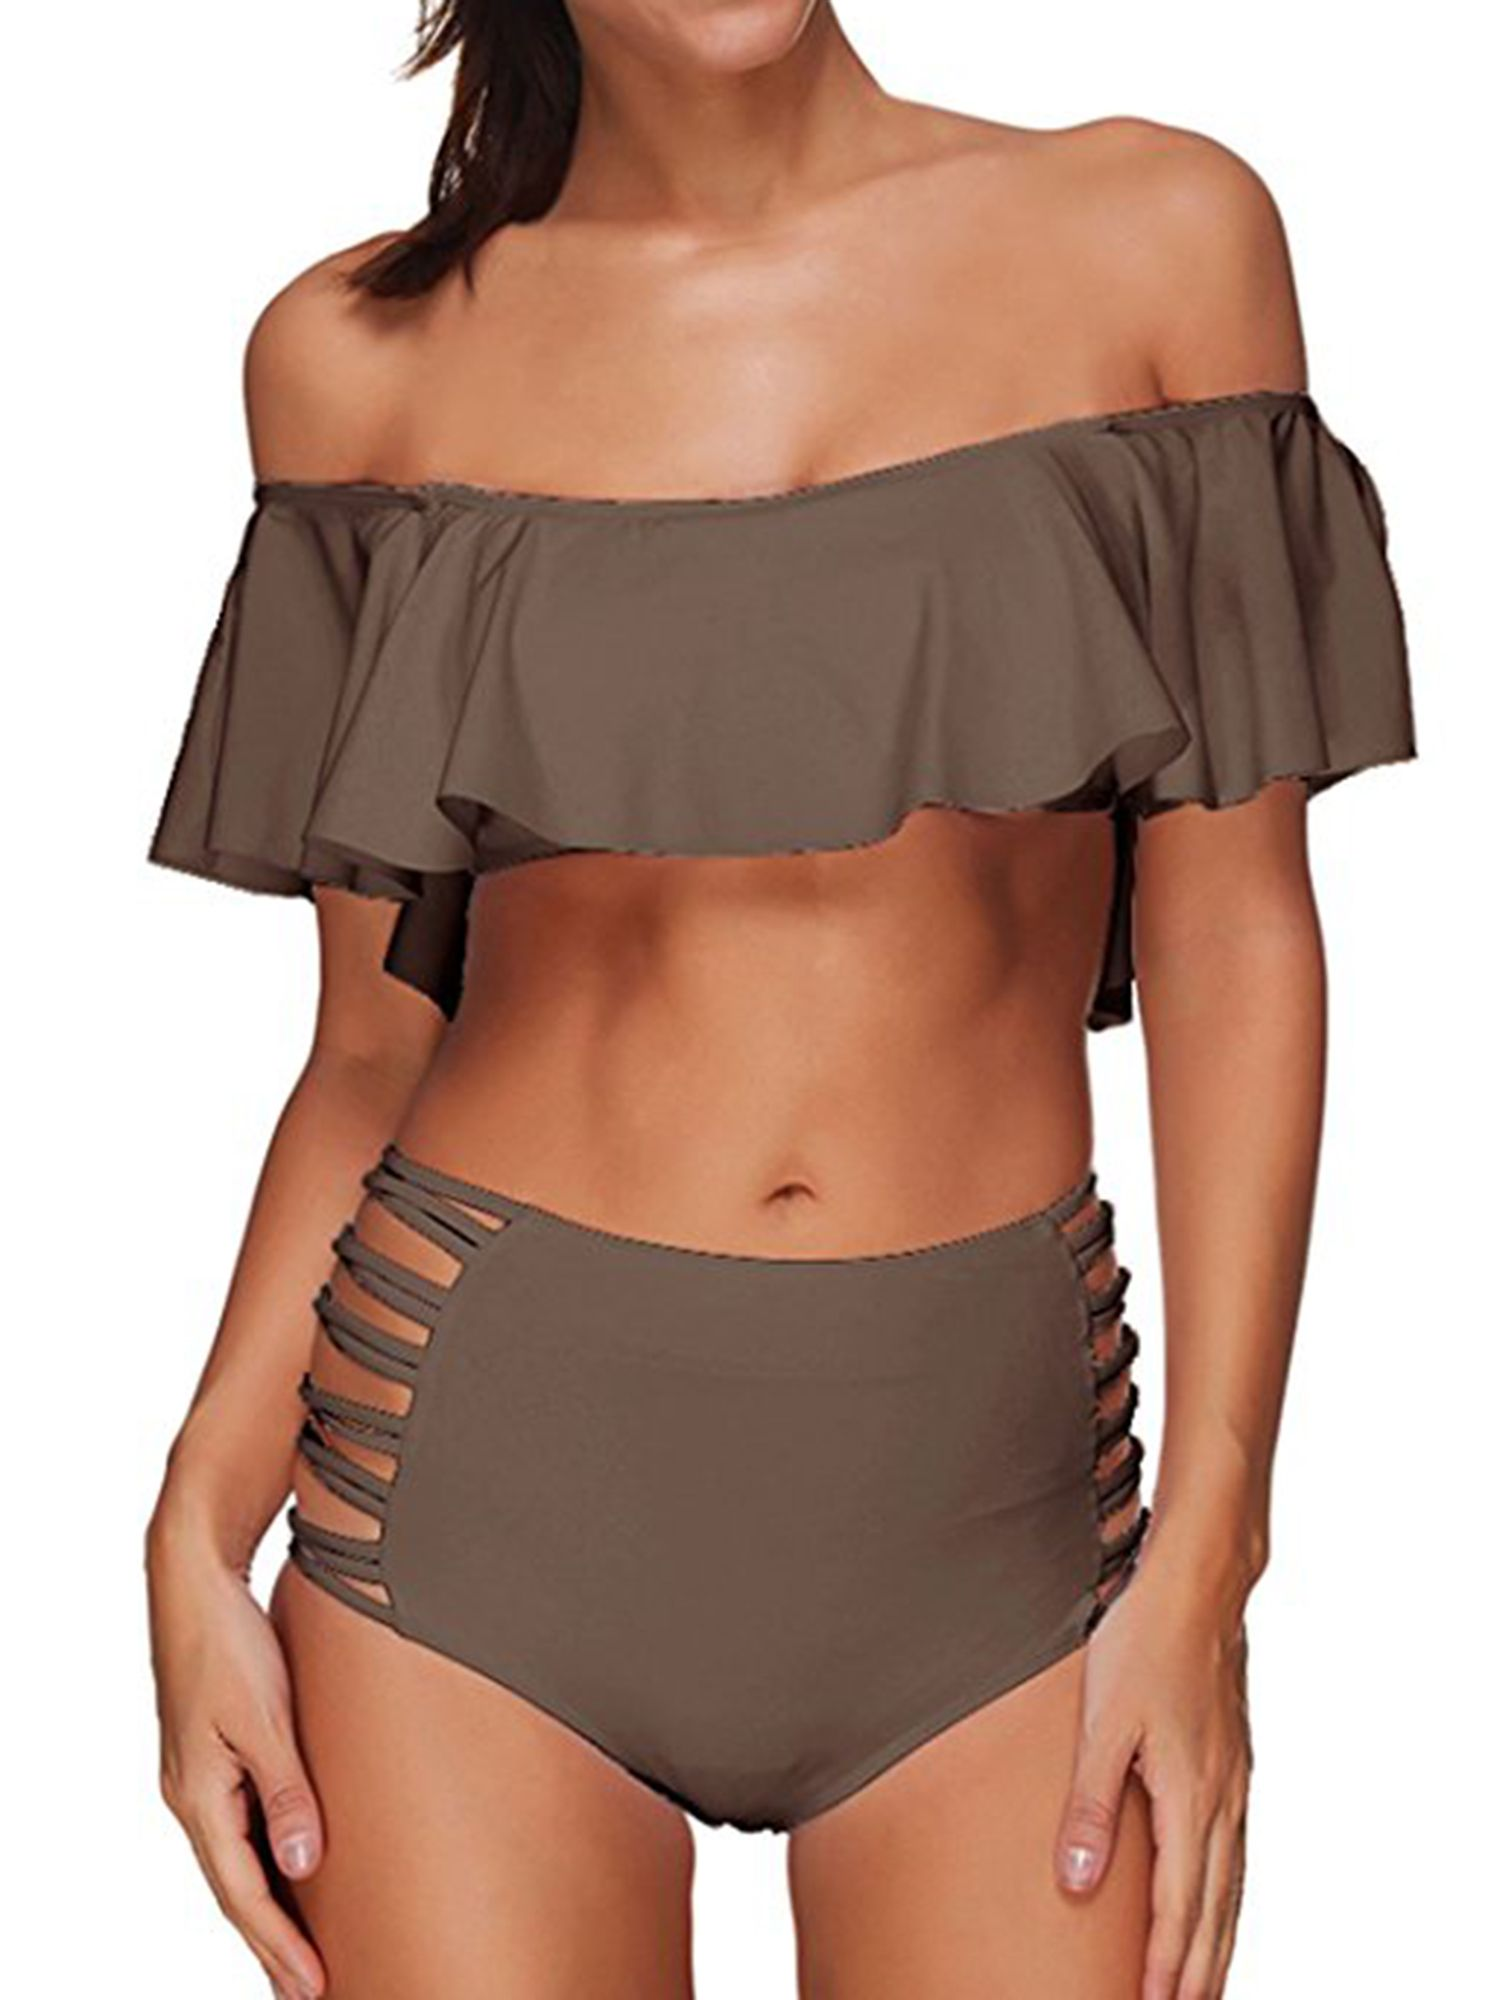 7c5ea0700f7 LELINTA Women Two Piece Swimsuit Set Off Shoulder Ruffled Flounce Crop  Bikini Top with High Waist Cut Out Bottoms Swimwear Five Color Shoulder